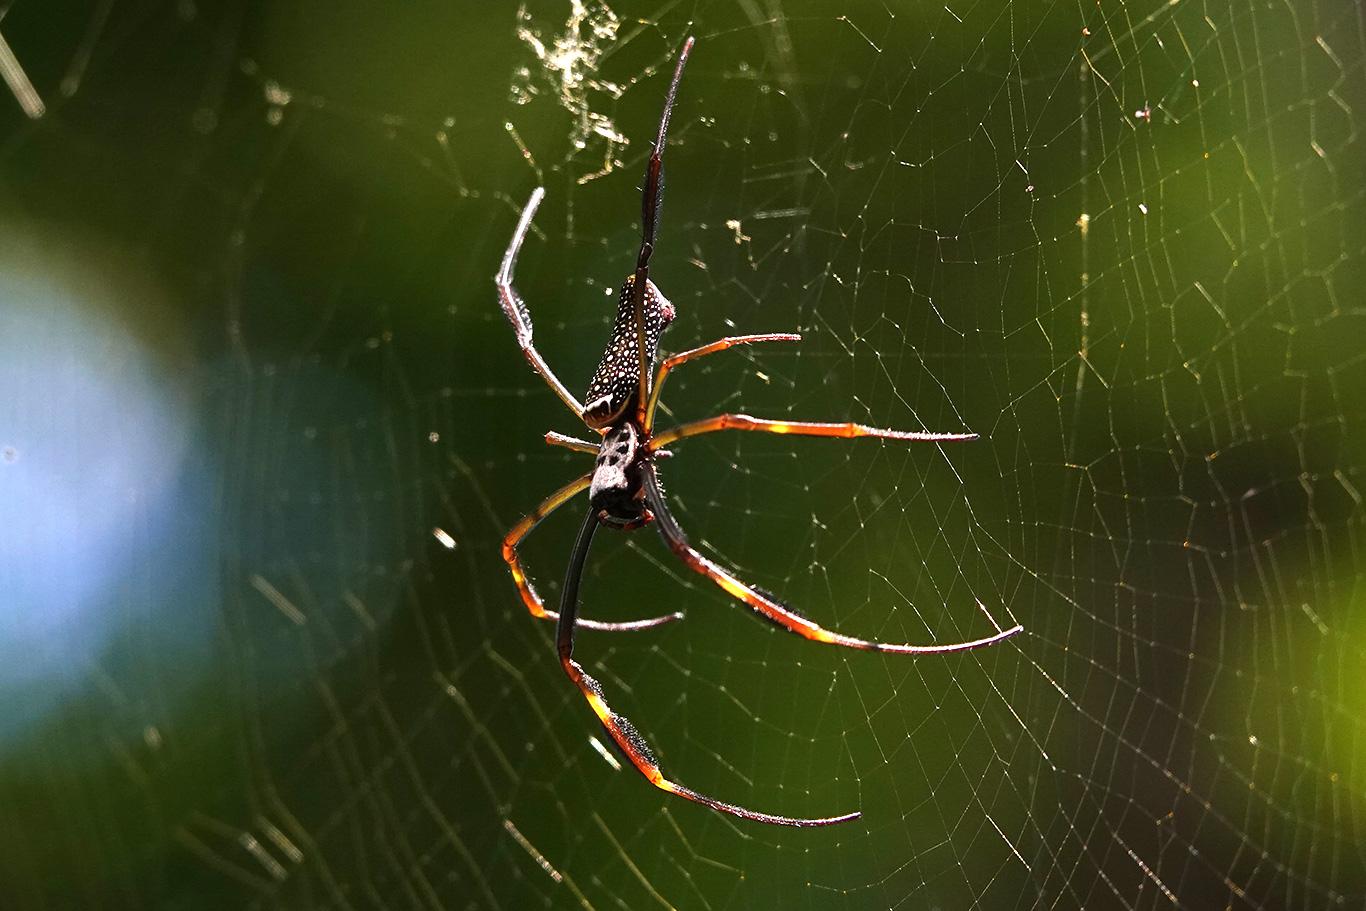 Spider sp., Parque Nacional Iguazú, Argentina.